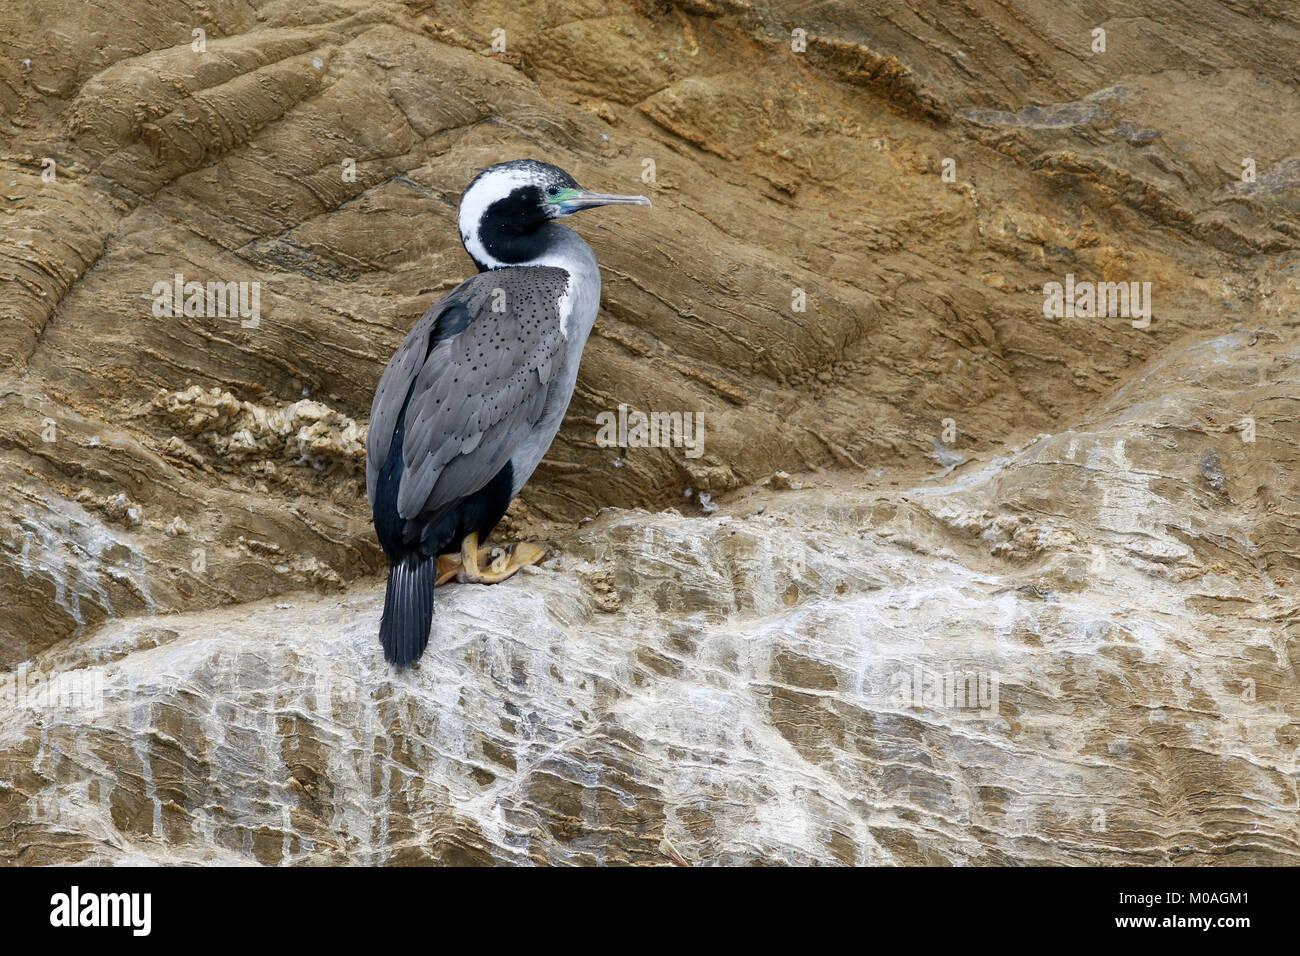 Spotted Shag, Phalacrocorax punctatus, at breeding cliff - Stock Image